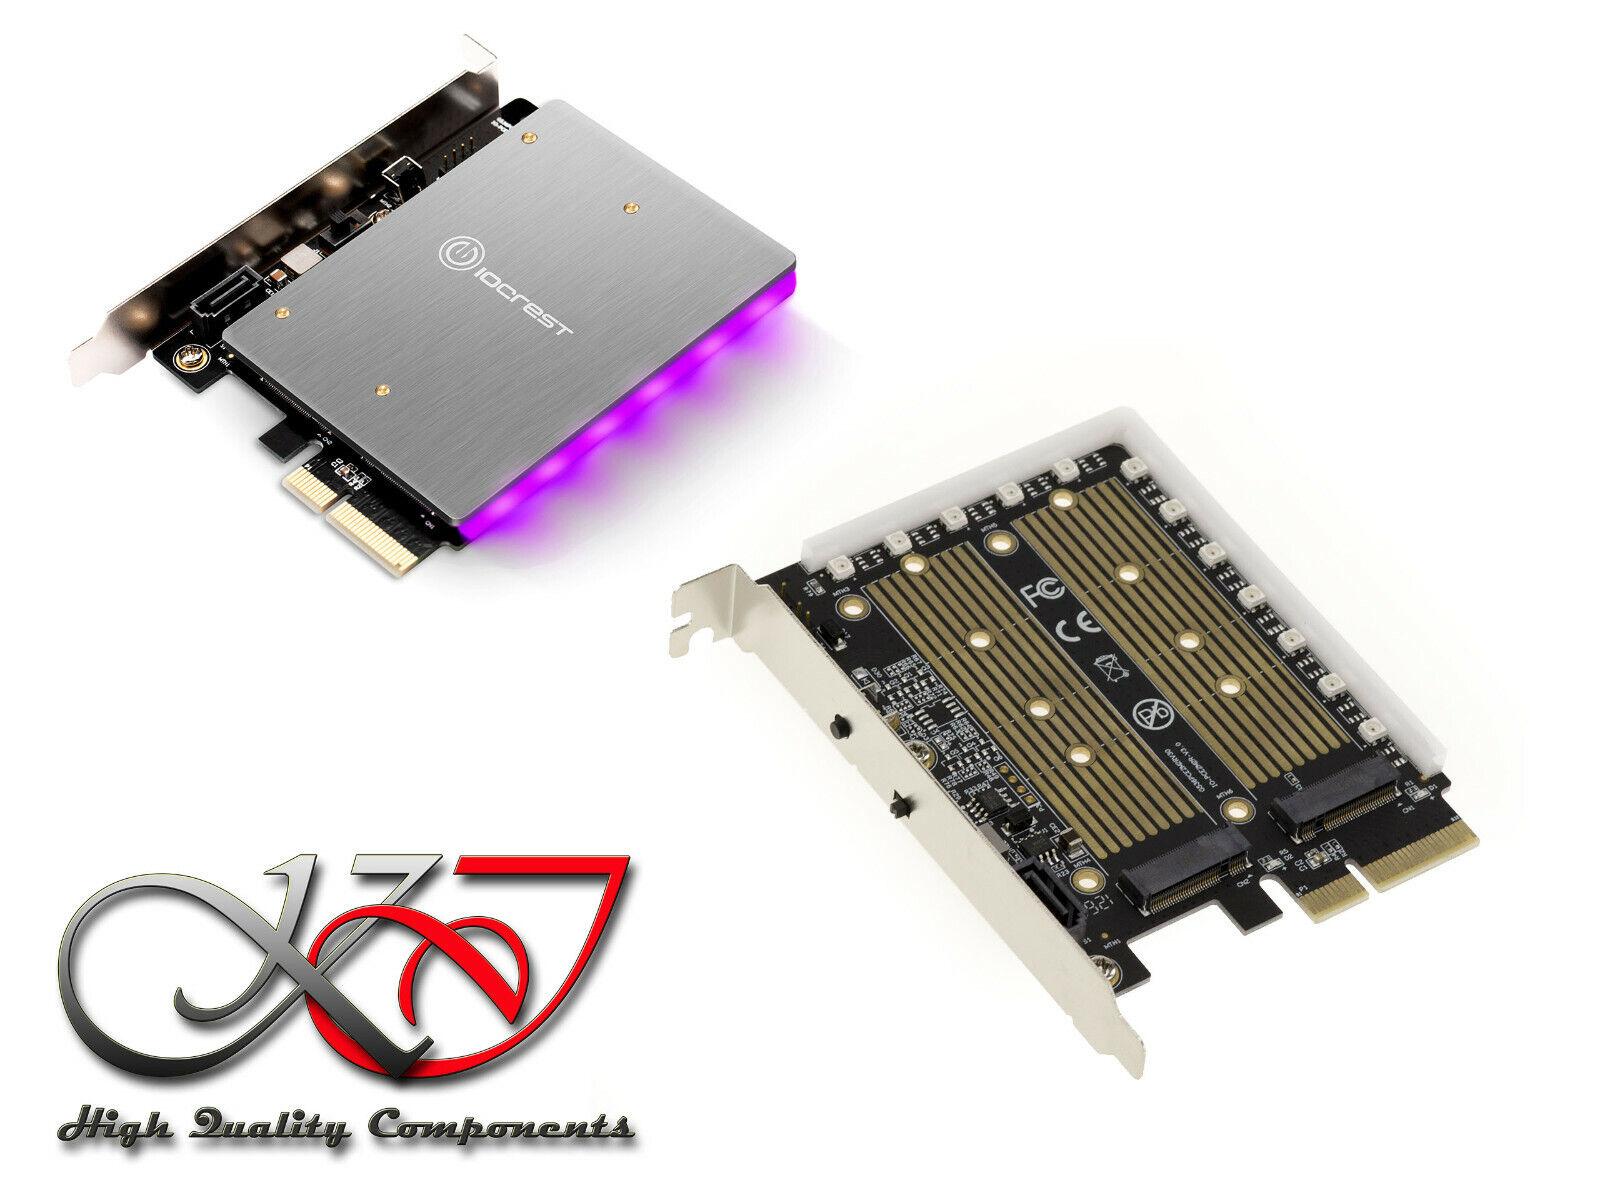 Controller Card Pcie 3.0 x4 For SSD M2 Pcie M Key And SATA B Key - LED RGB